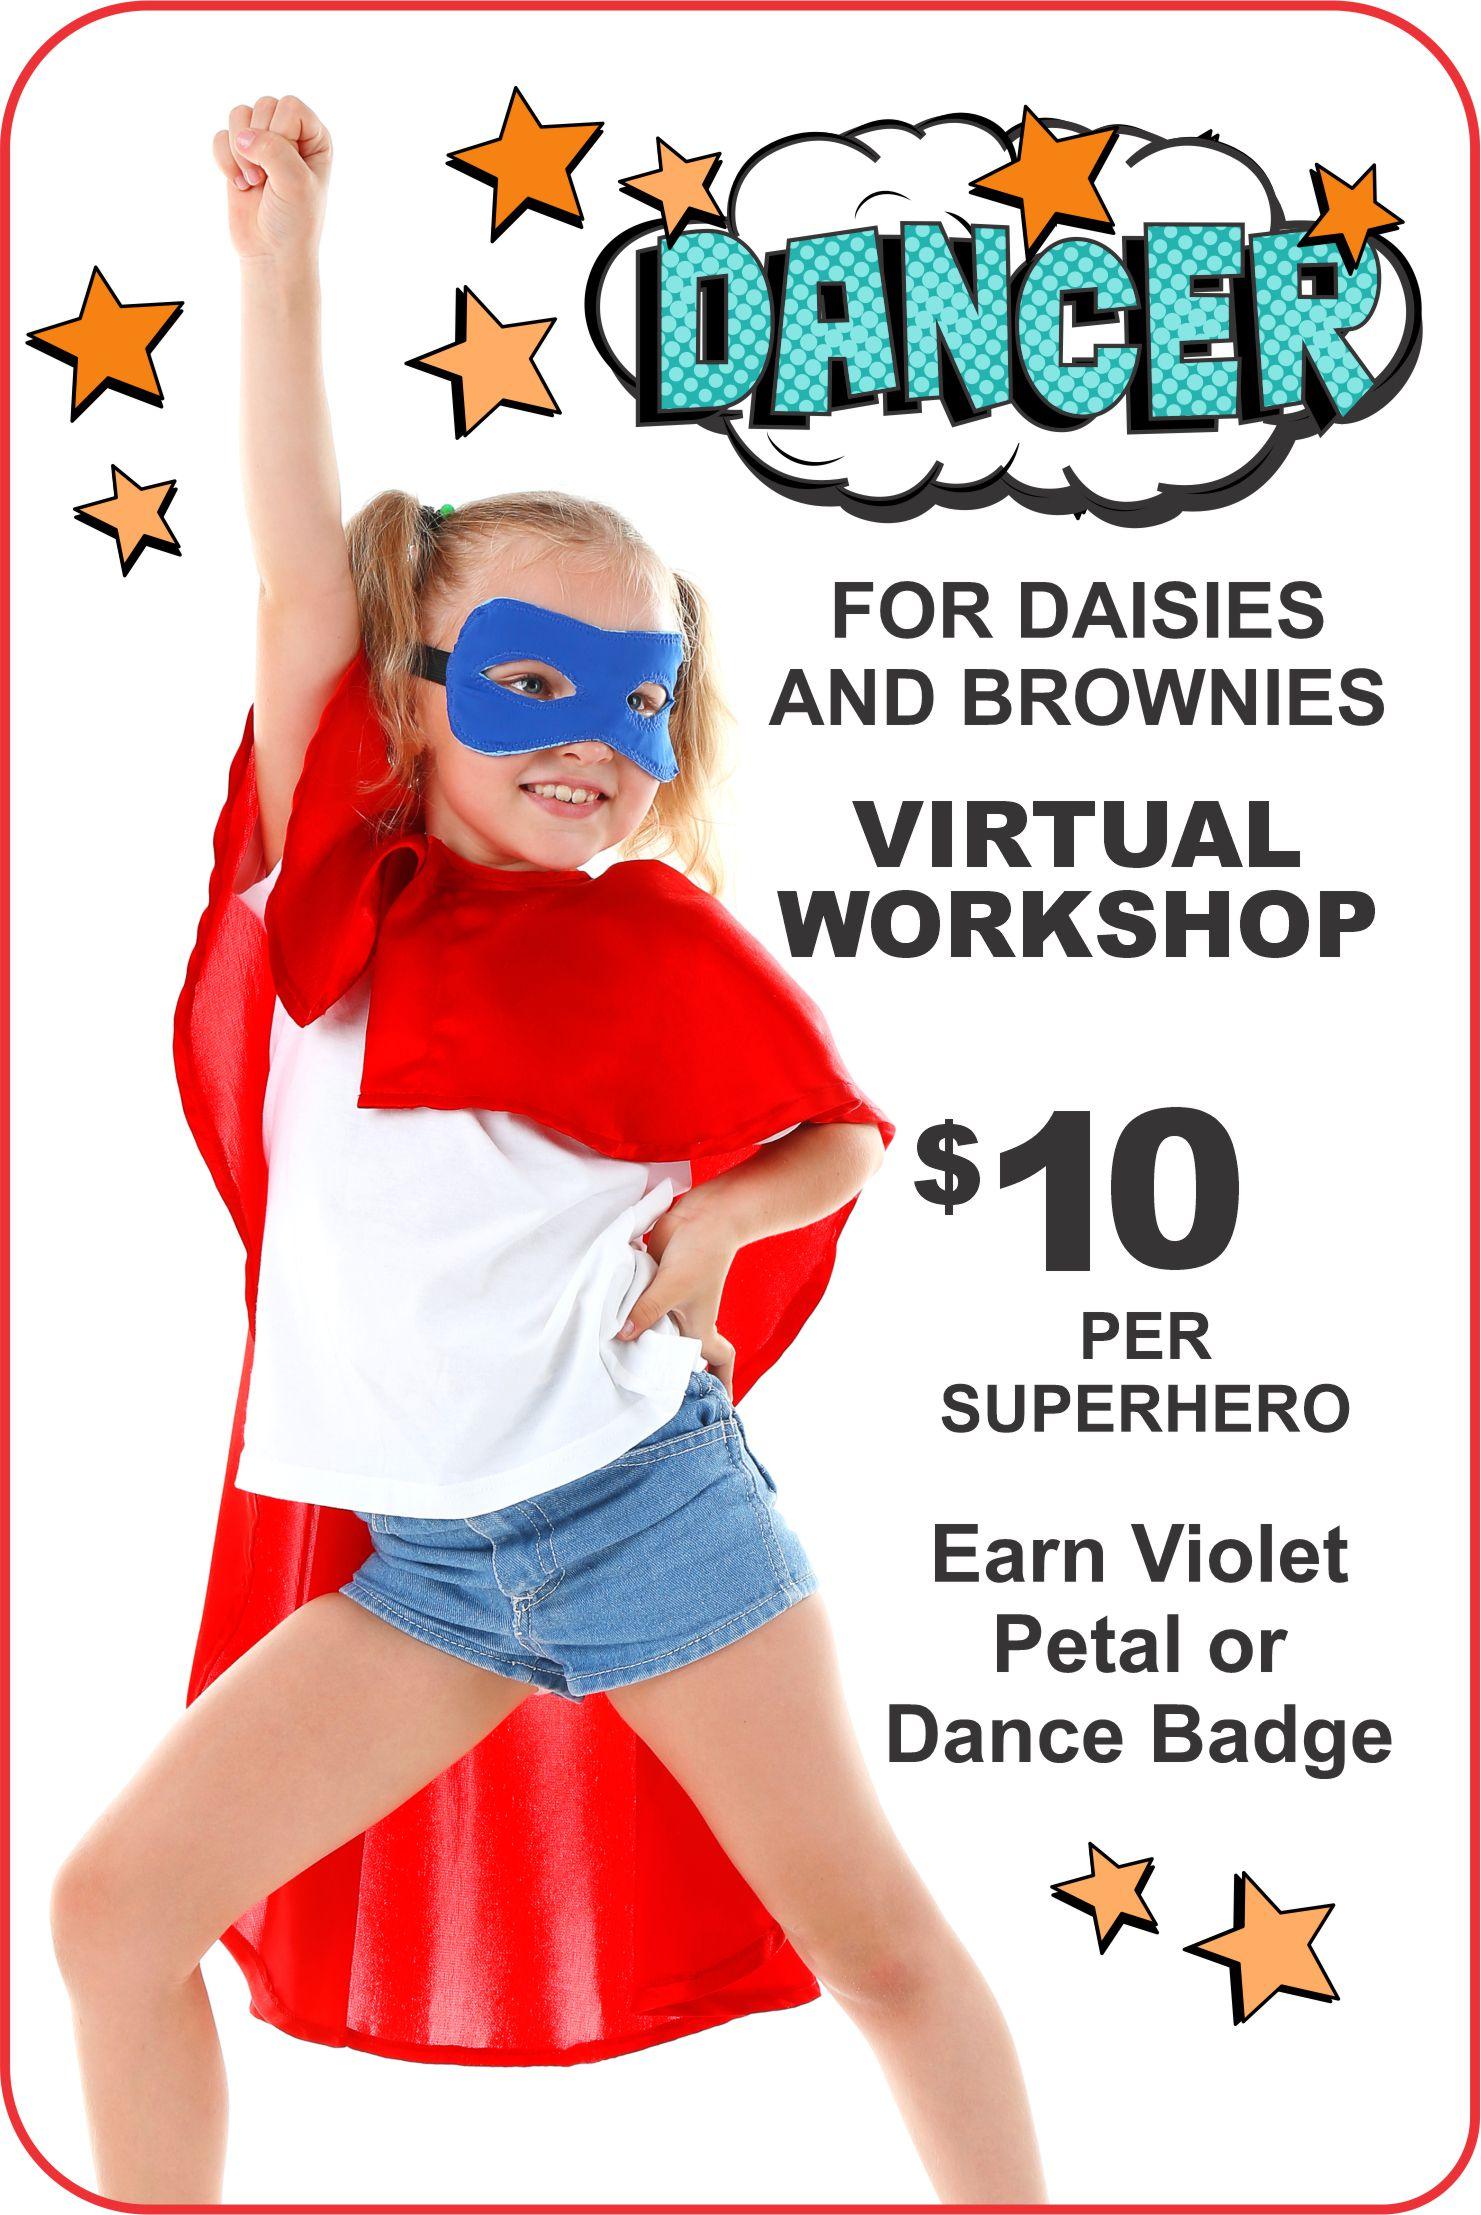 Virtual Brownie And Daisy Workshop Superhero Dancer Dec